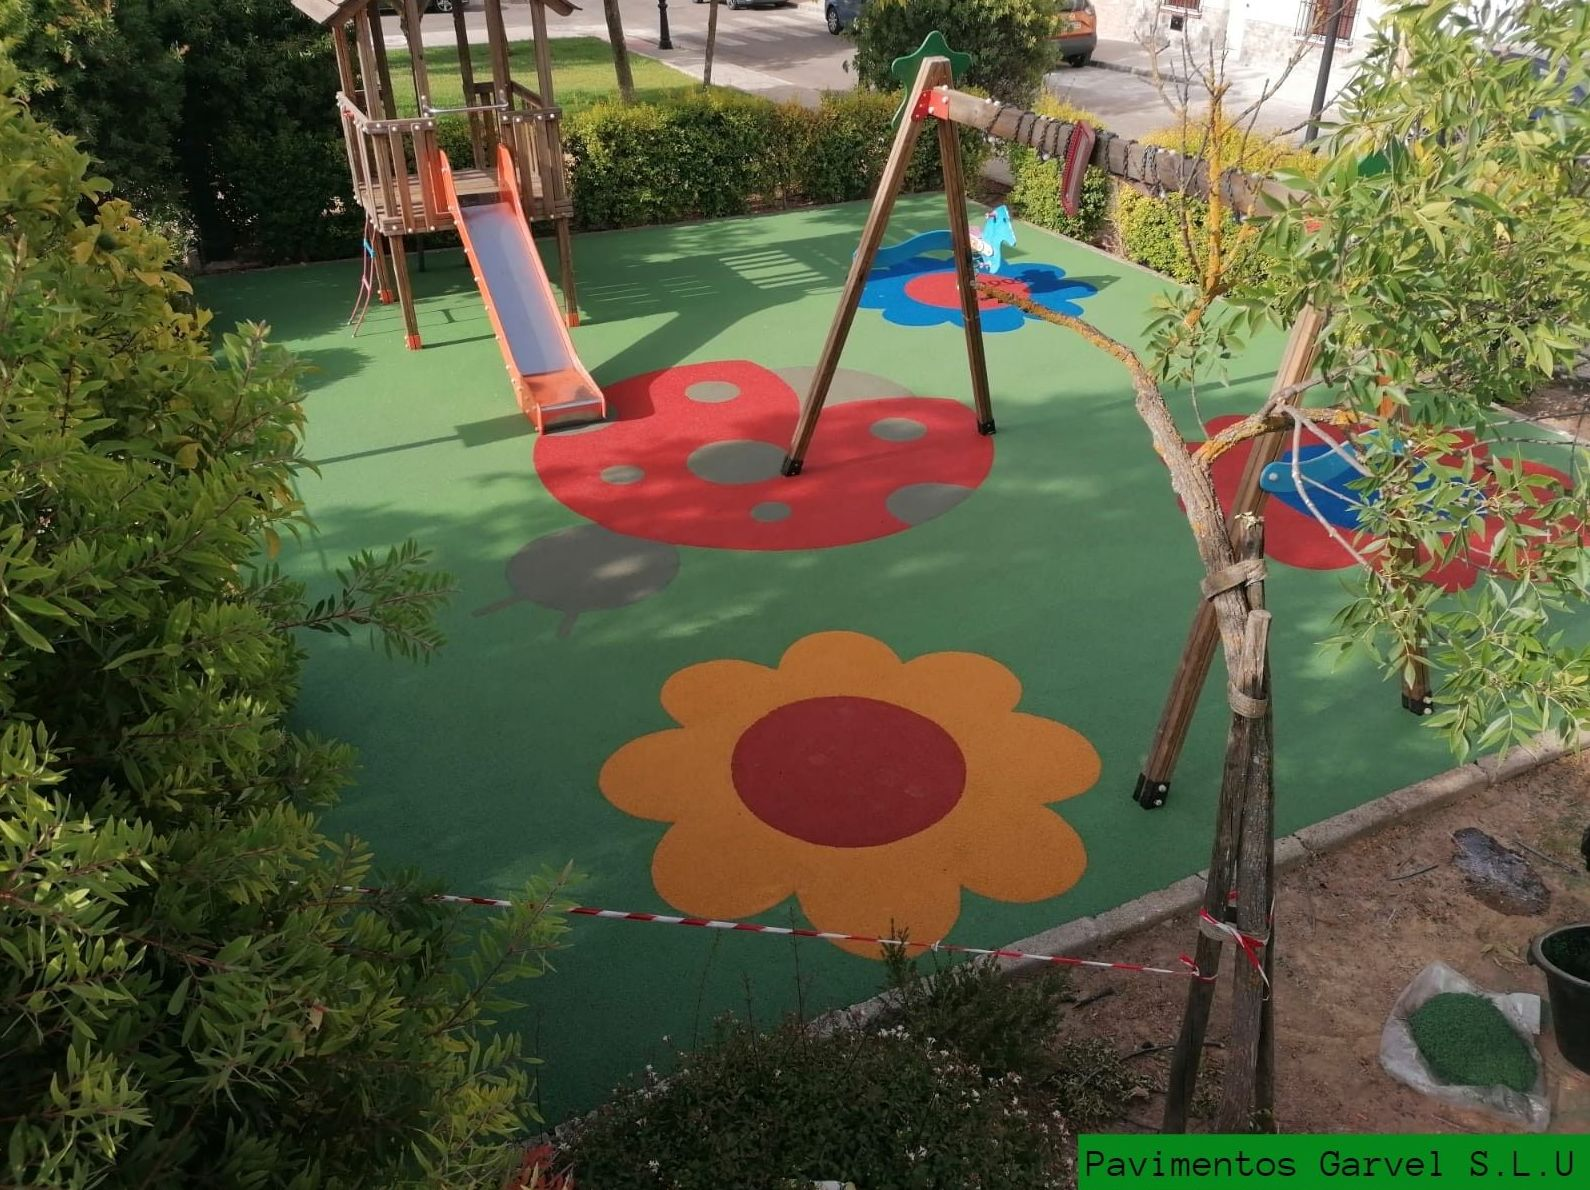 Foto 9 de Instalación de pavimentos de caucho para parques infantiles en Las Cabezas de San Juan   Pavimentos Garvel